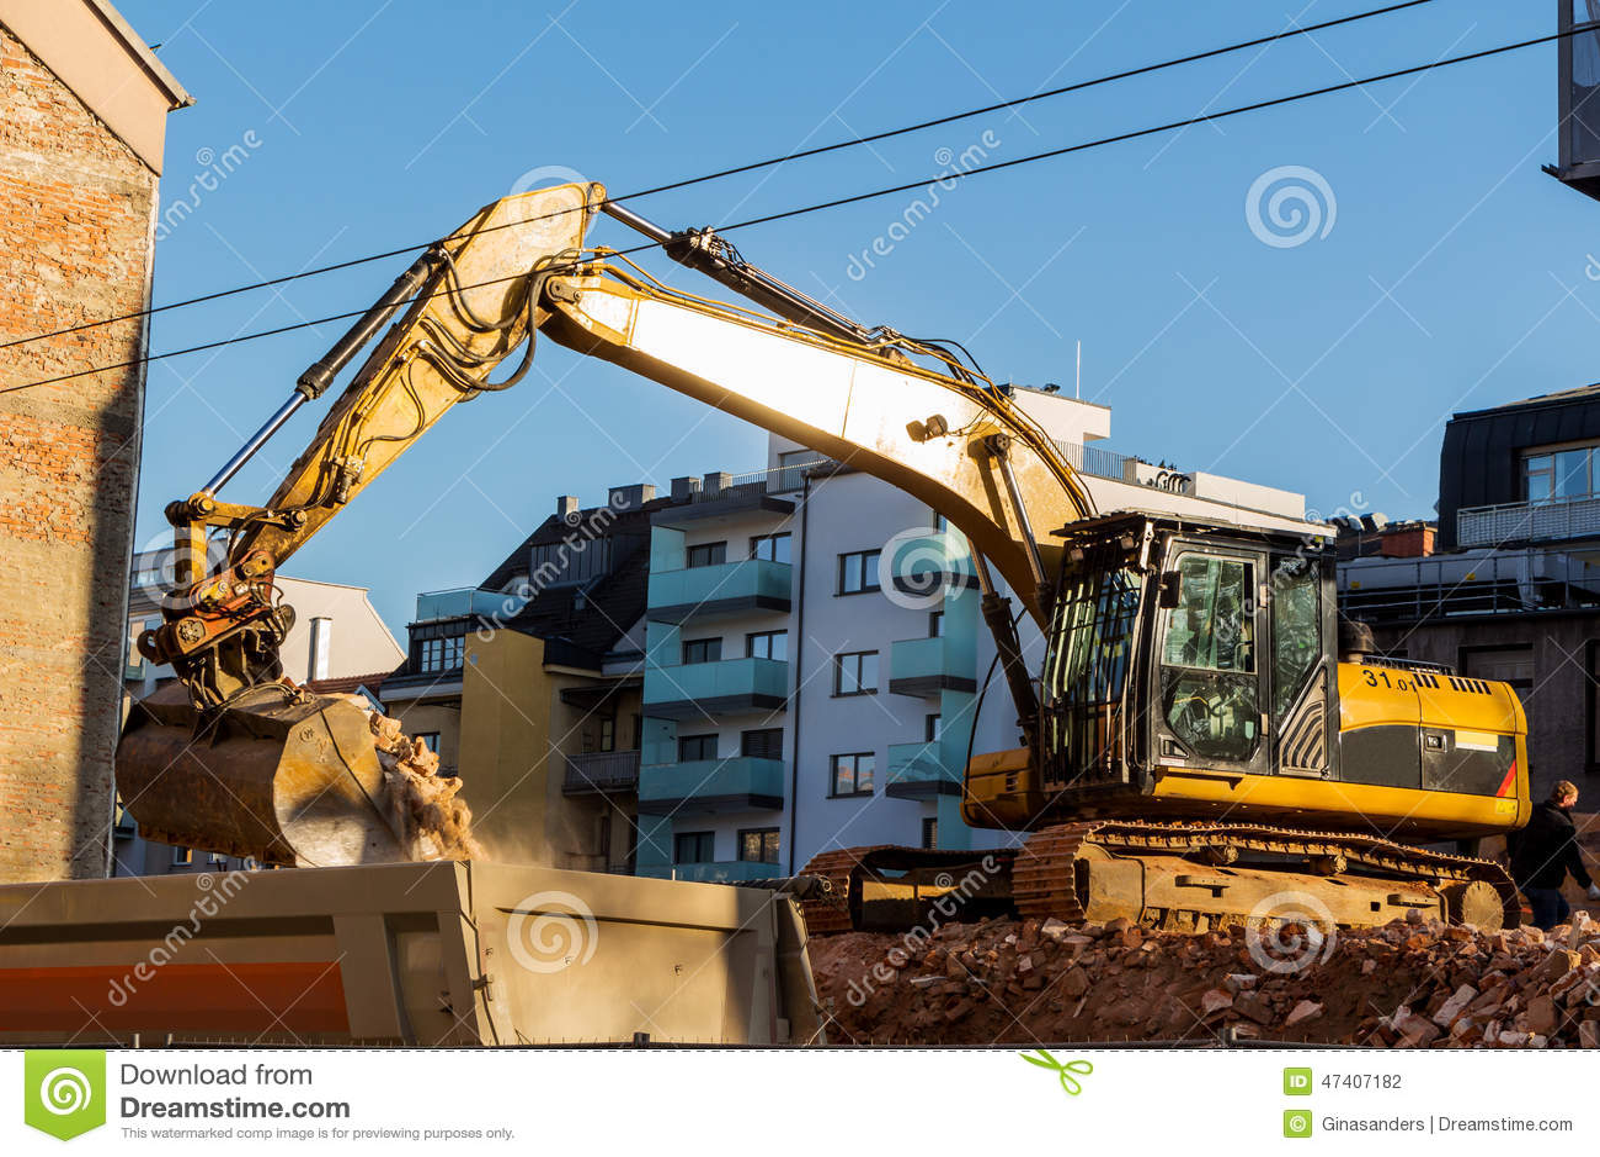 Building Demolition Cartoon : Construction demolition site royalty free stock photo